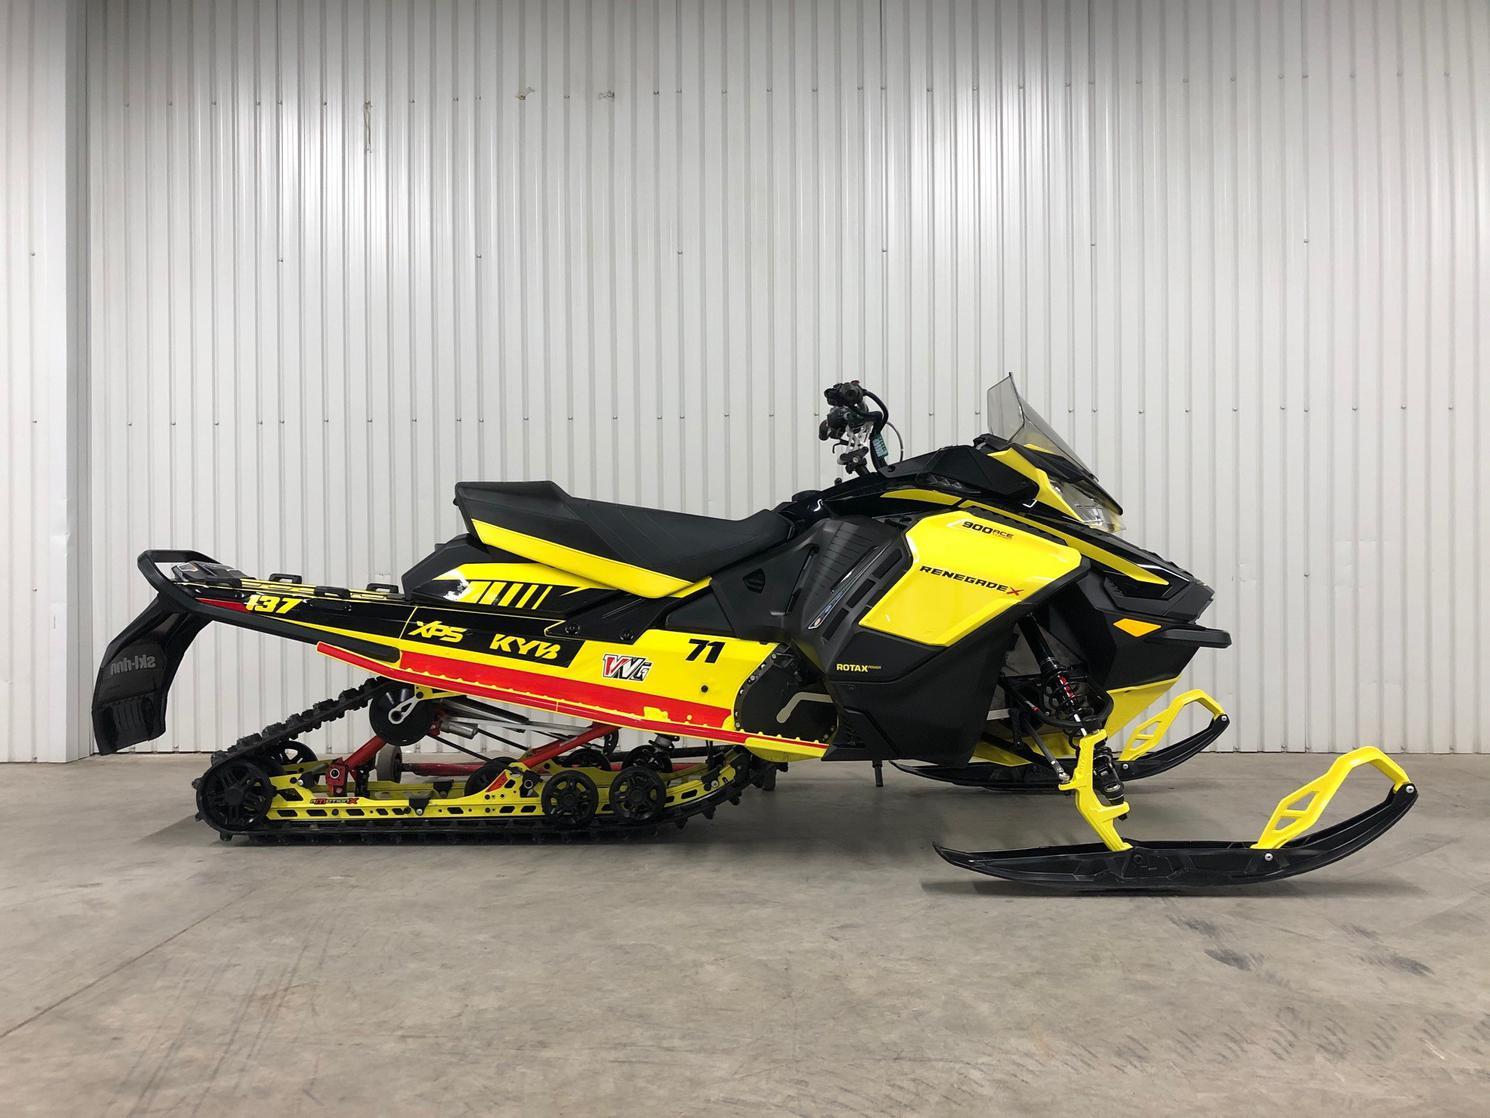 Ski-Doo renegade x 900 ace turbo 2021